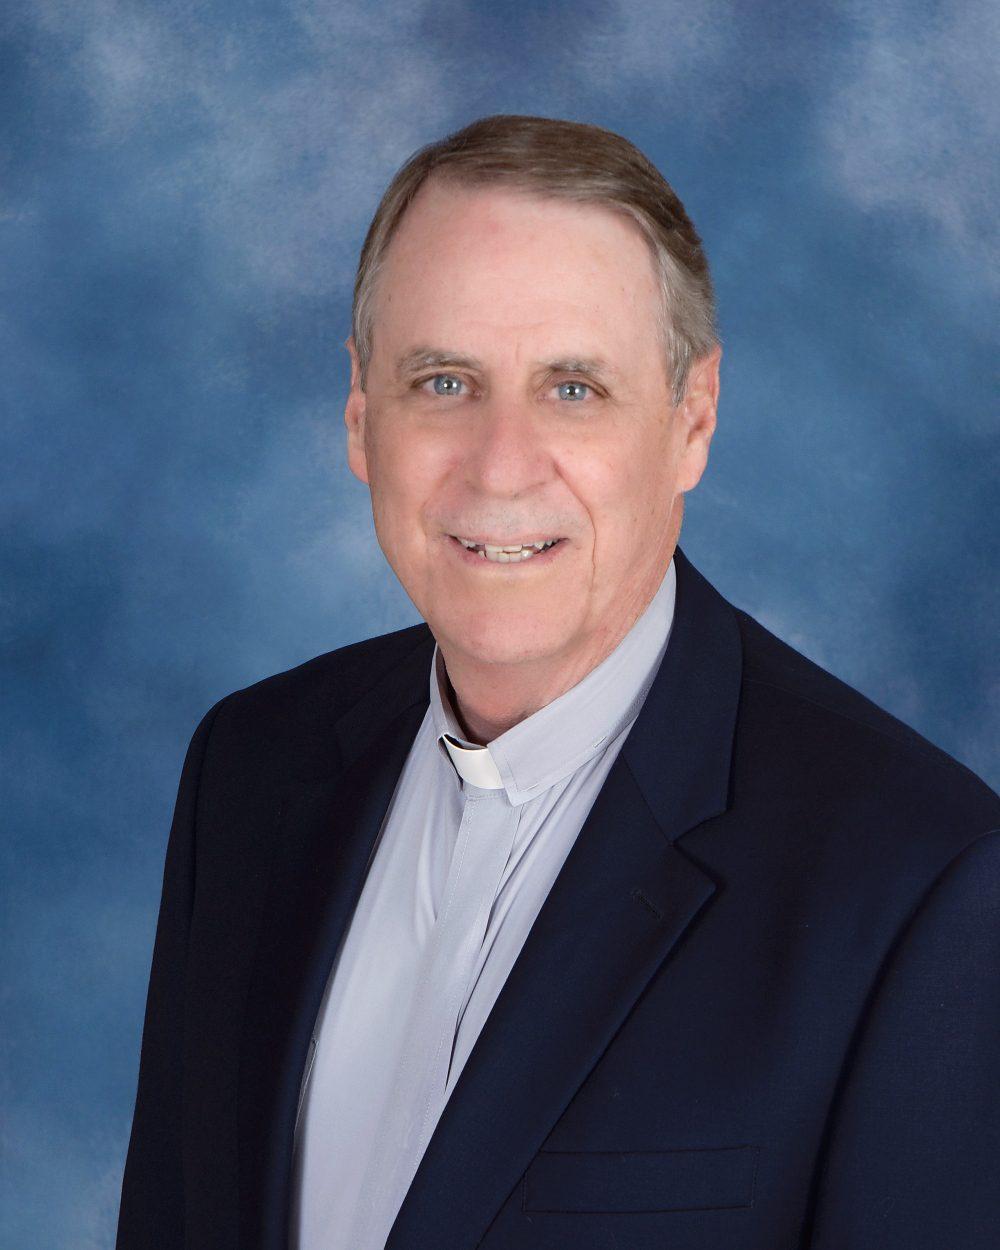 Deacon Charles Weir : Deacon